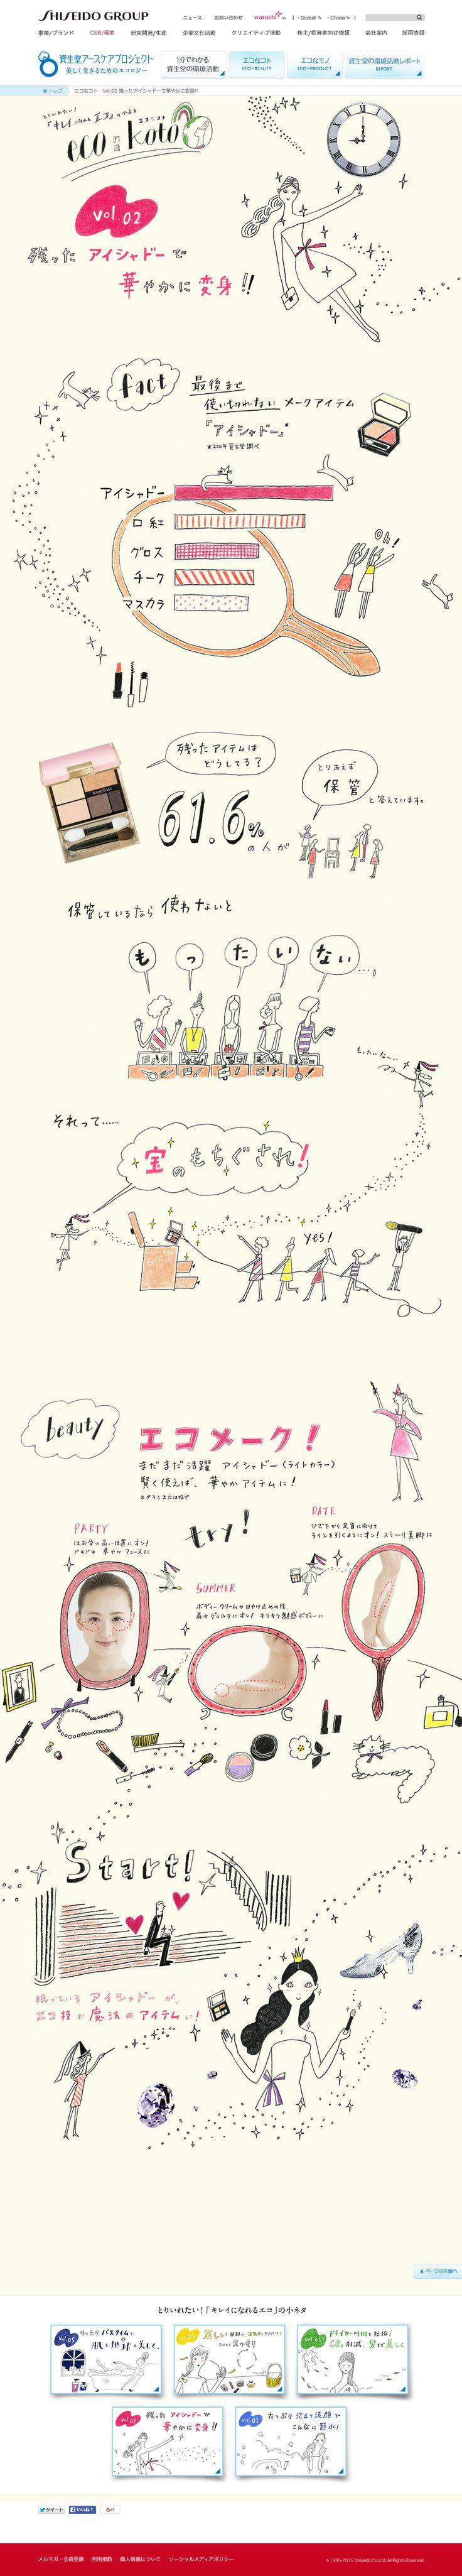 http://www.shiseidogroup.jp/eco/column/detail02/